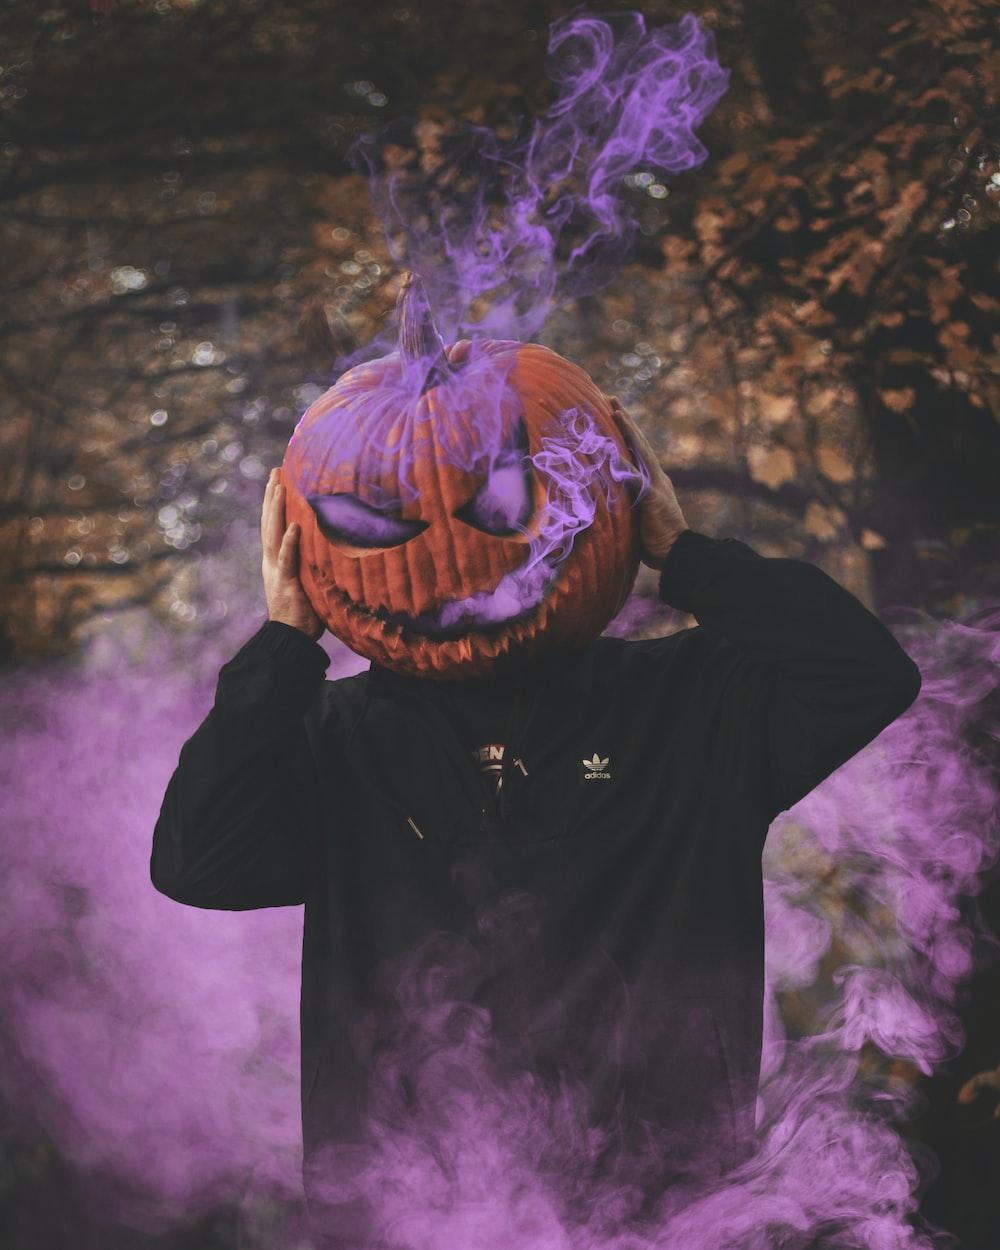 Free Fall Halloween Wallpaper.Halloween Wallpapers Free Hd Download 500 Hq Unsplash